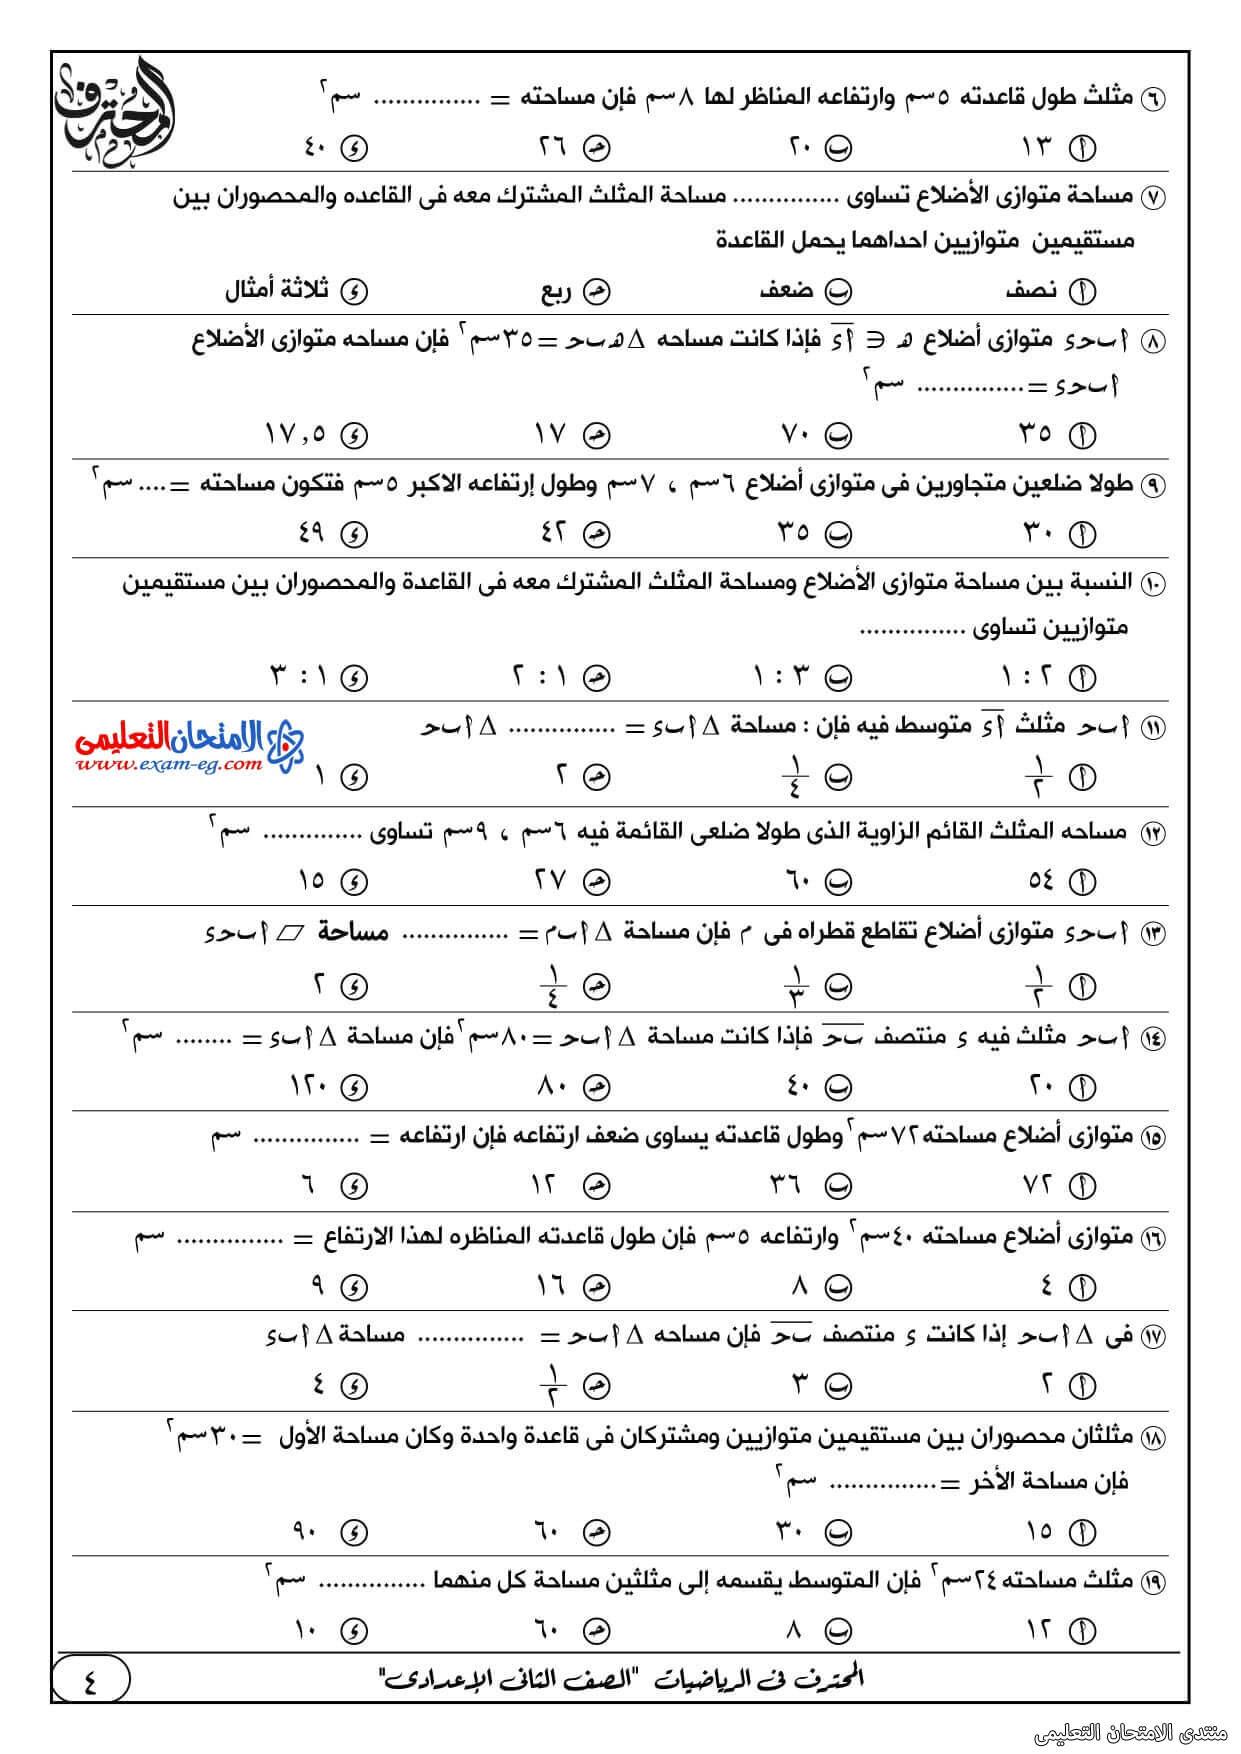 exam-eg.com_16166042242044.jpg